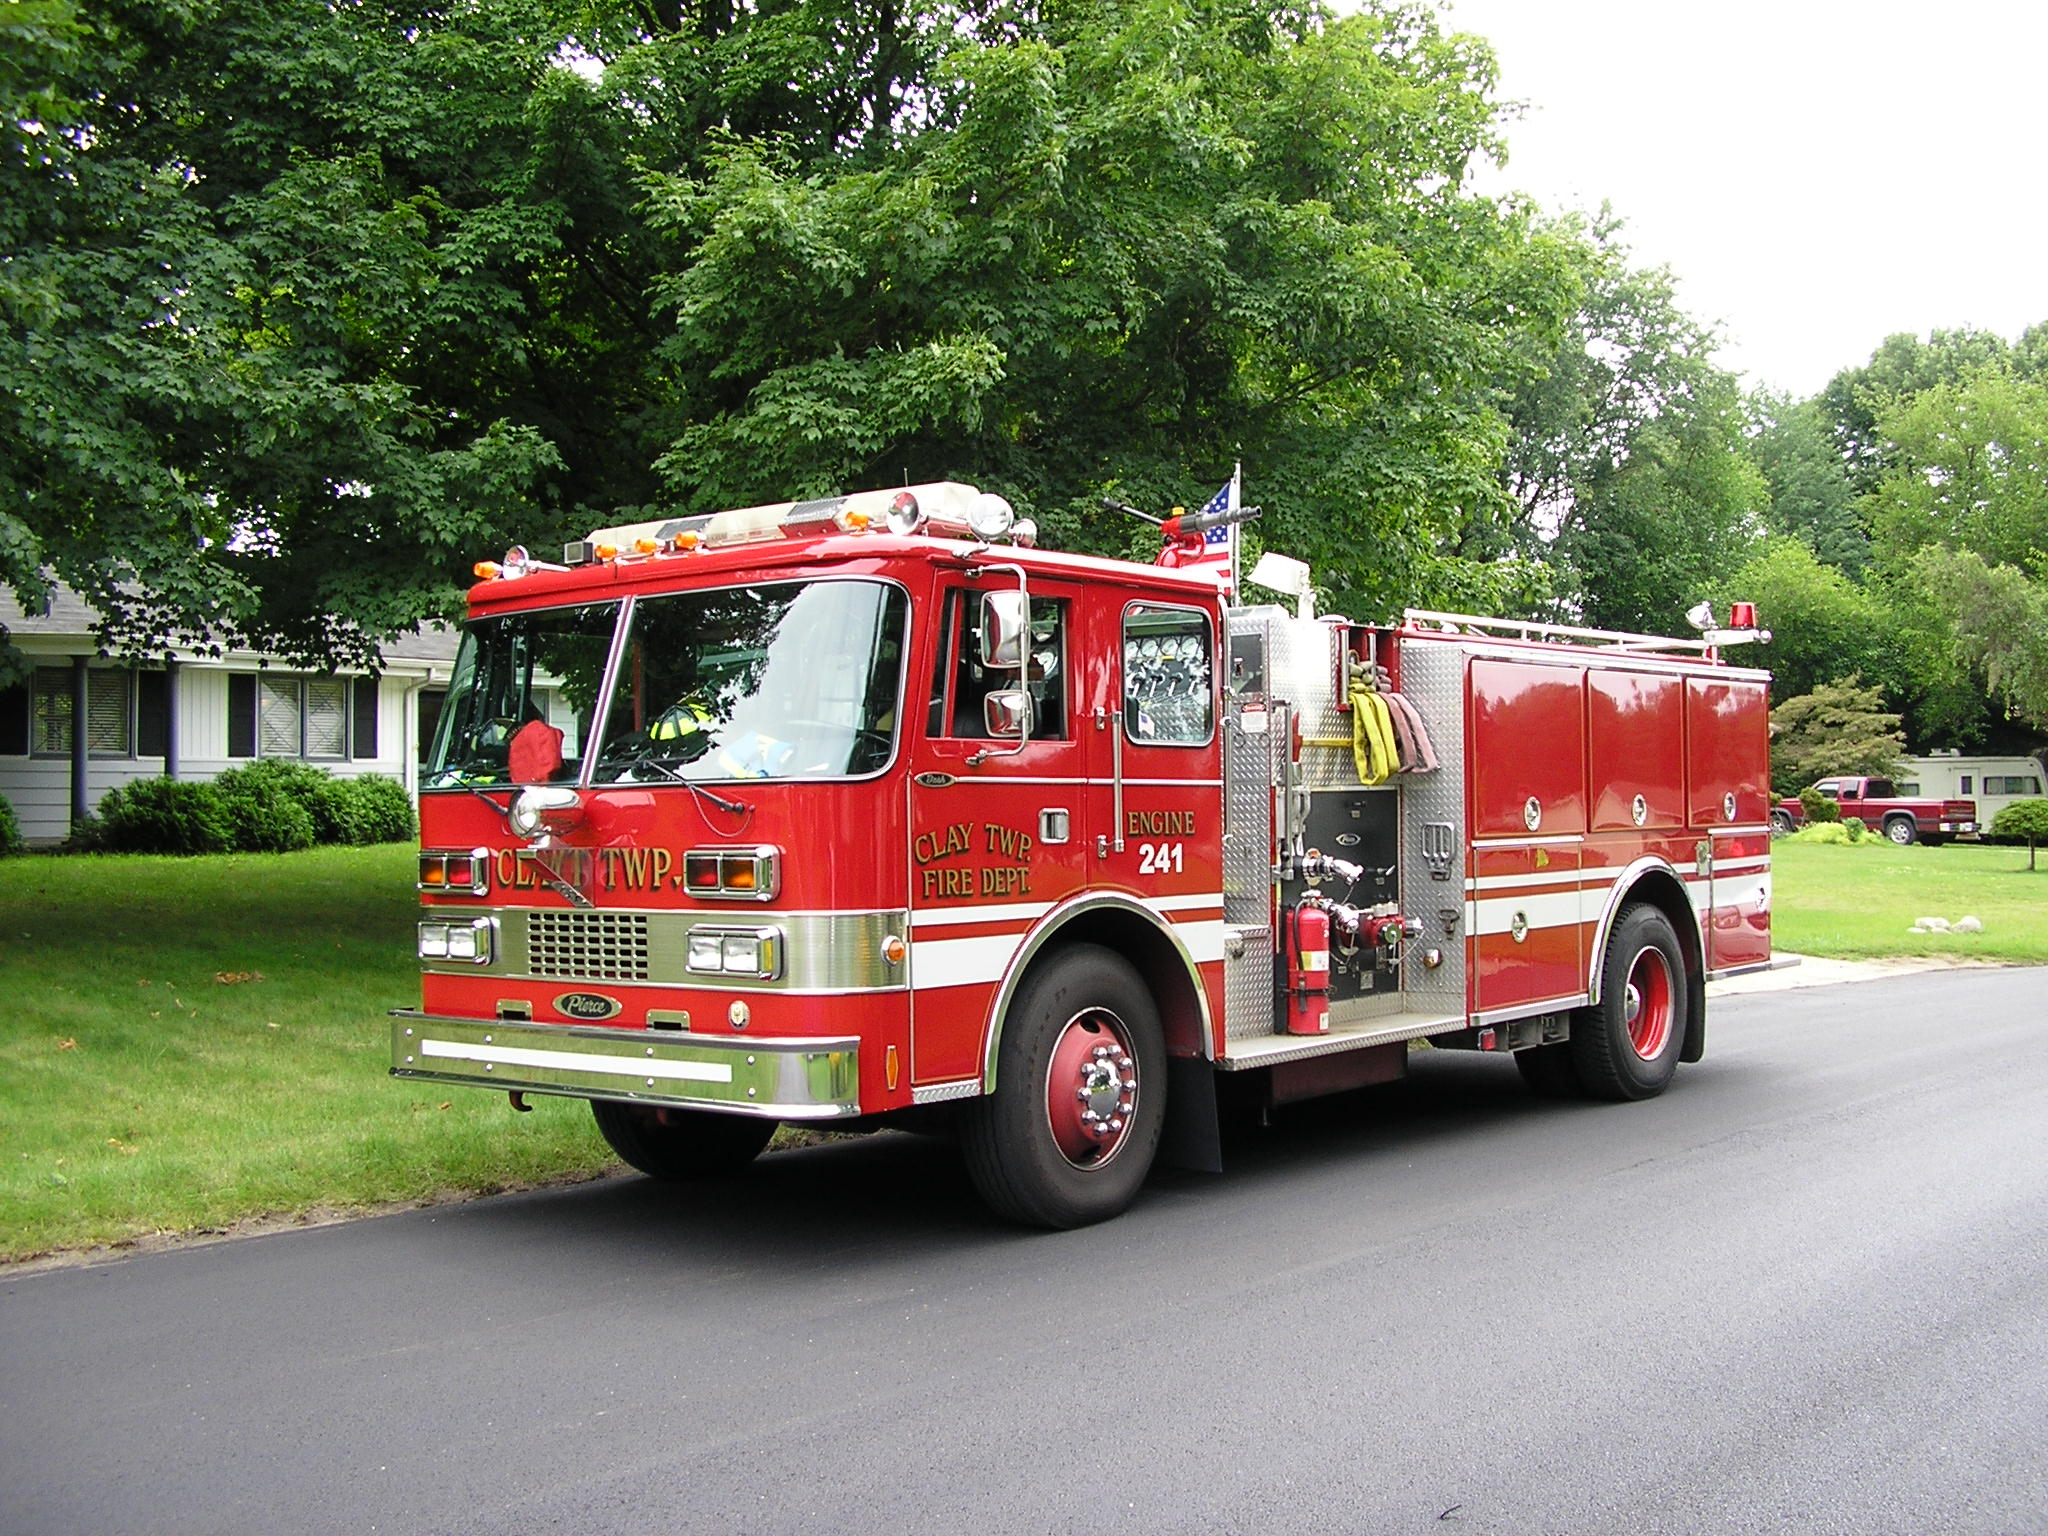 https://i0.wp.com/upload.wikimedia.org/wikipedia/commons/5/54/Fire_Engine_Clay_Twp.jpg